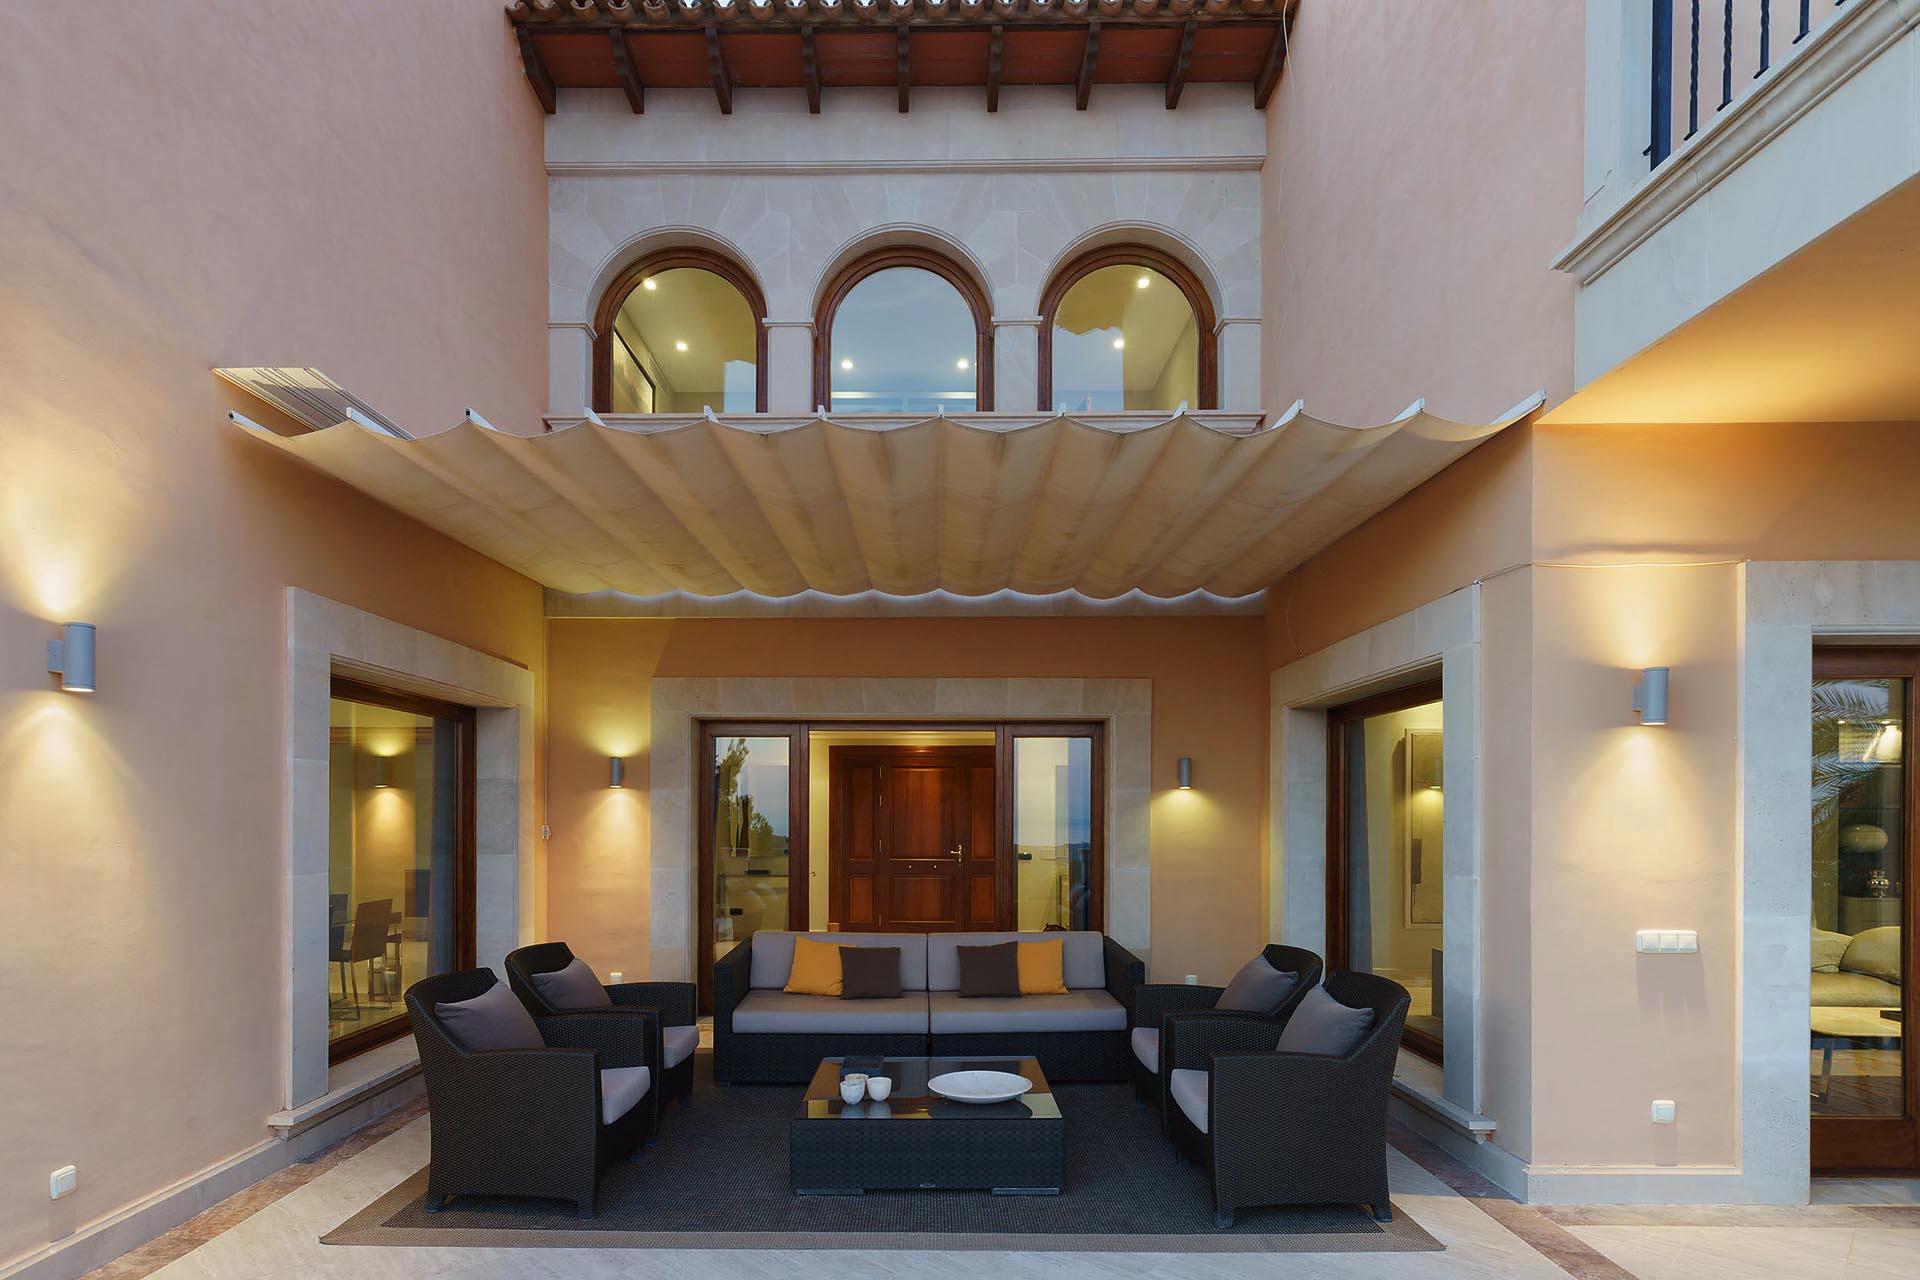 01-280 großzügige Villa nahe Palma de Mallorca Bild 11